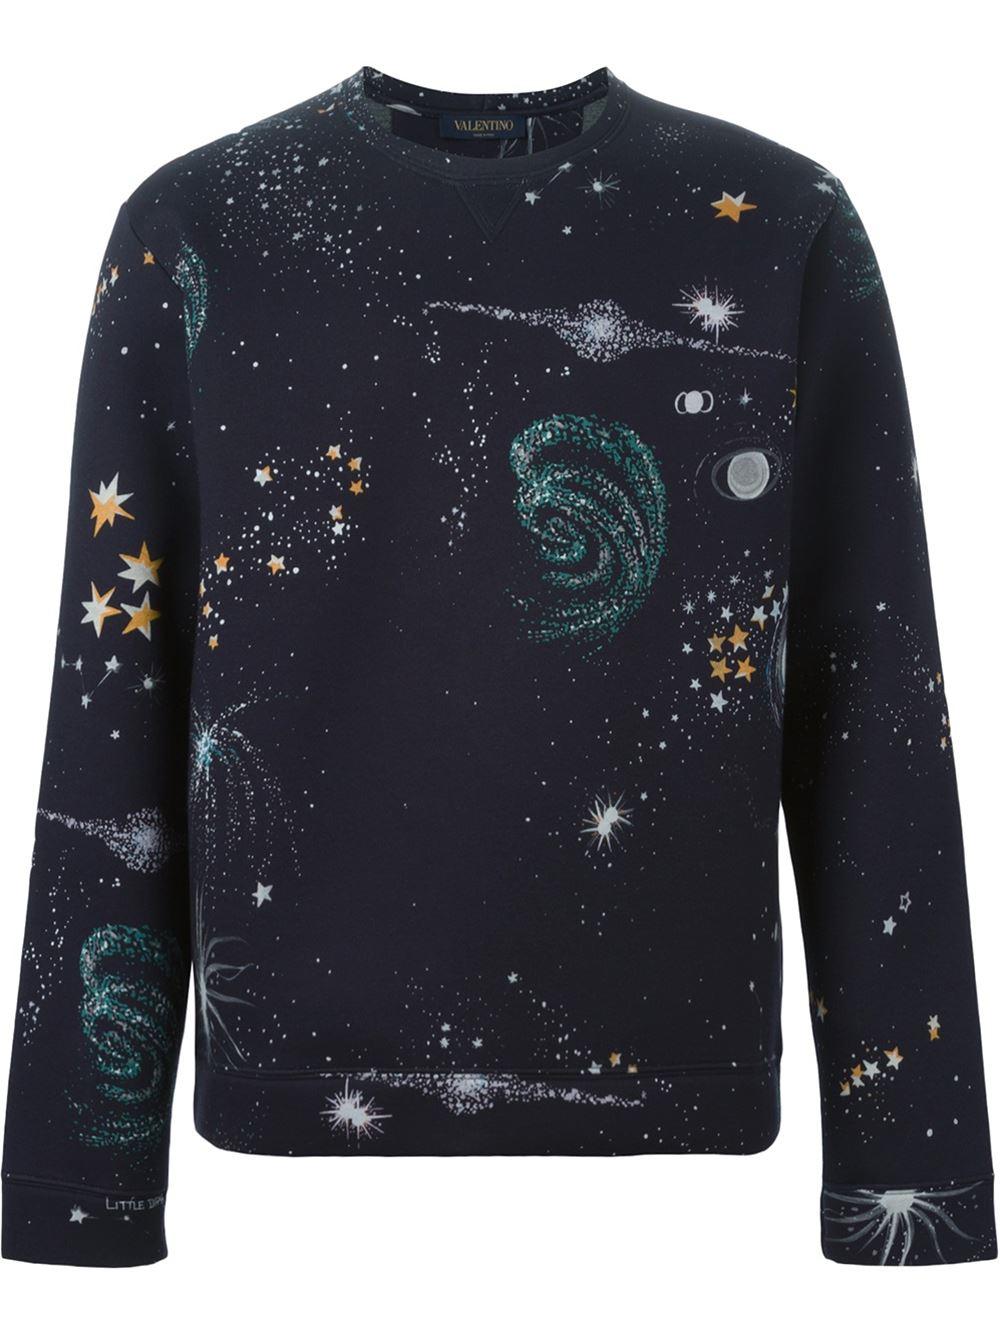 valentino-universe-print-sweatshirt-1